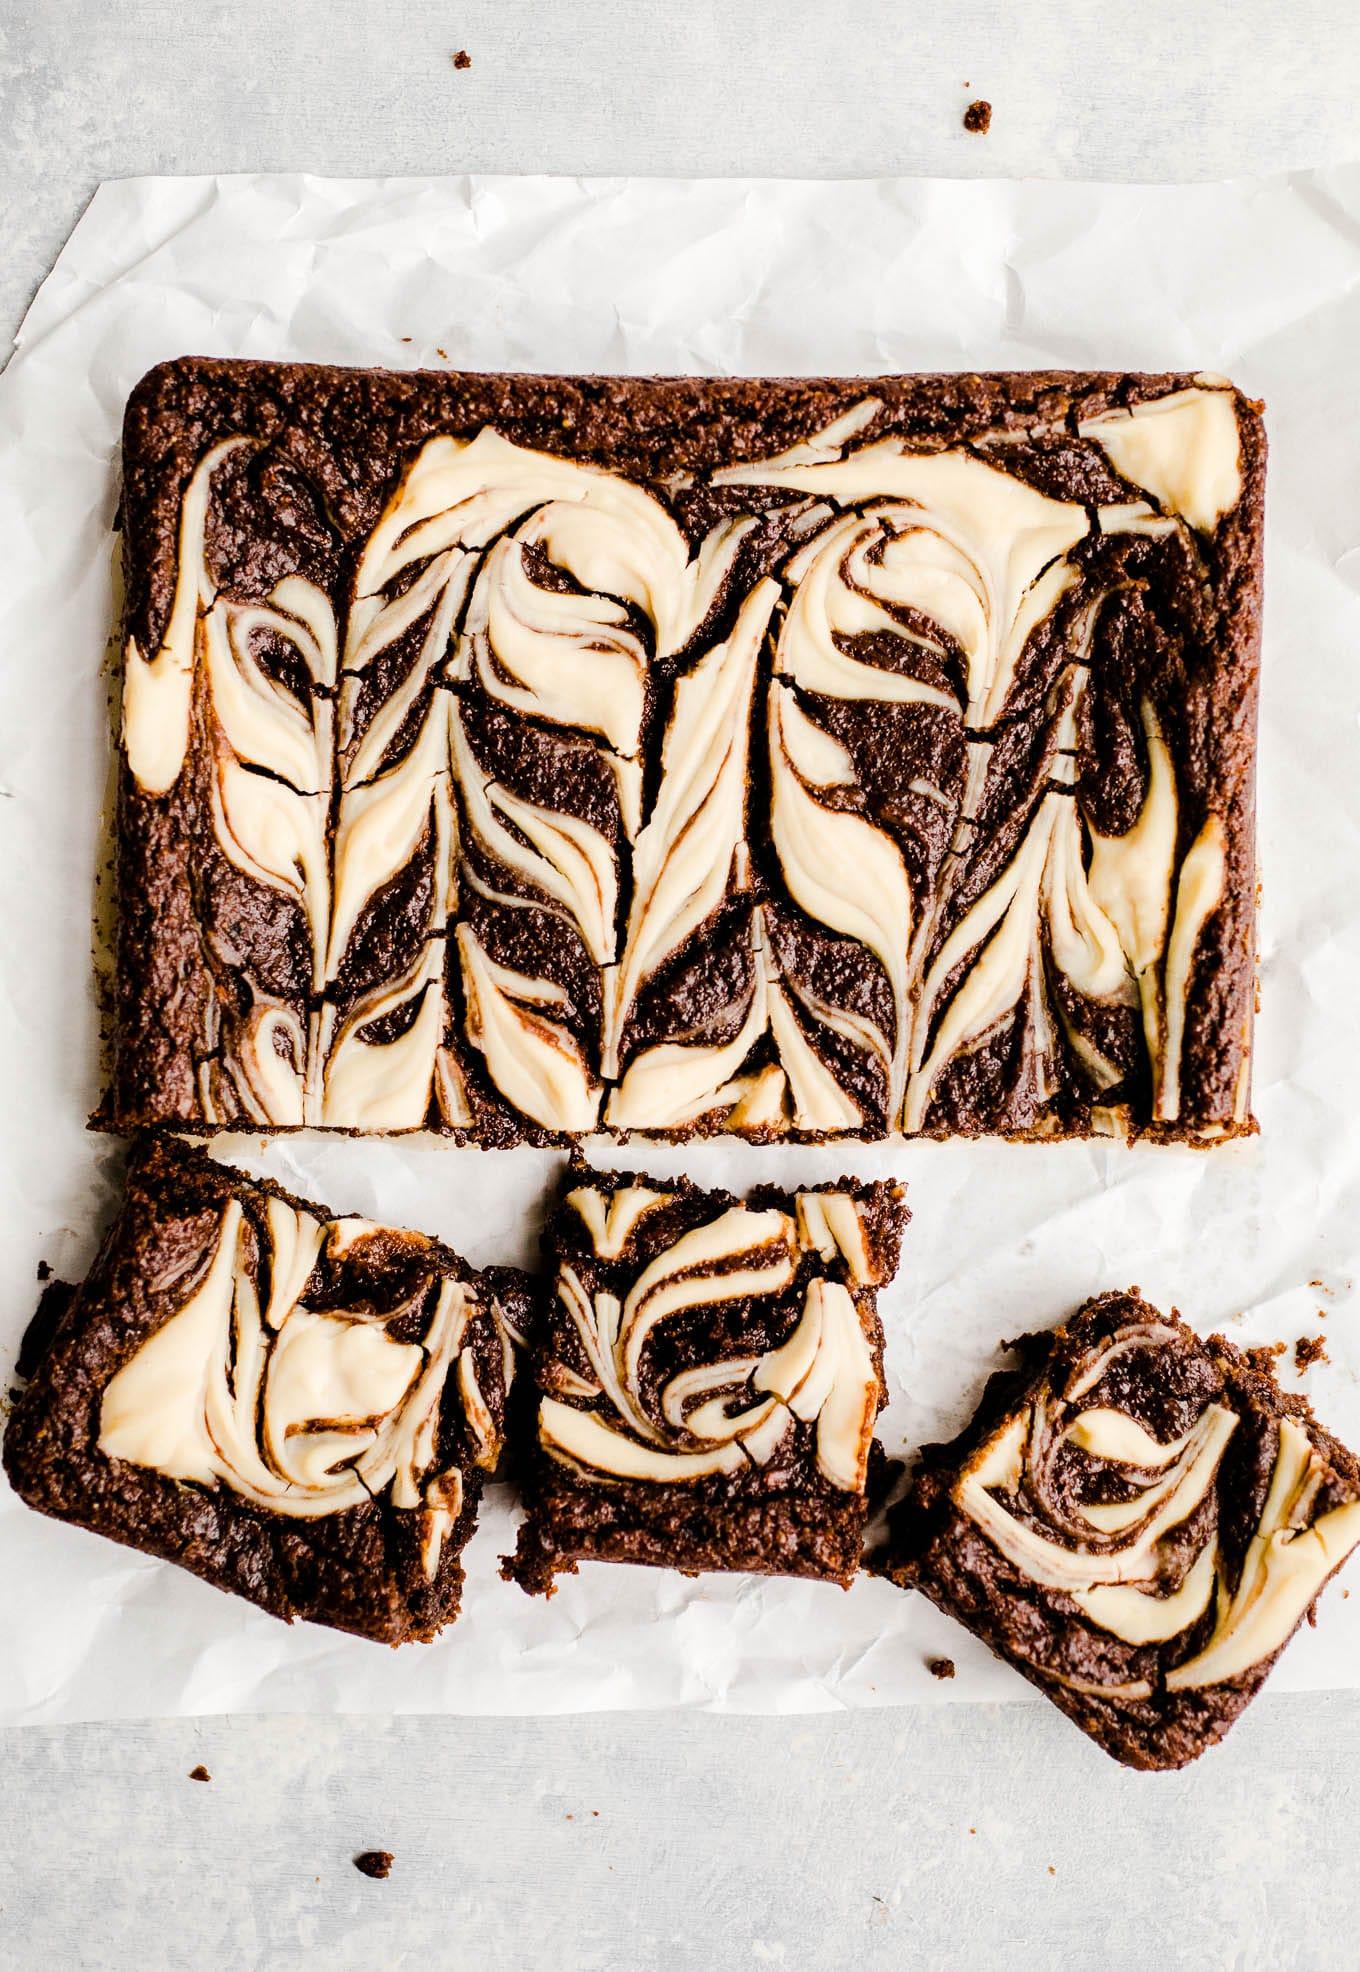 brownies with white swirls